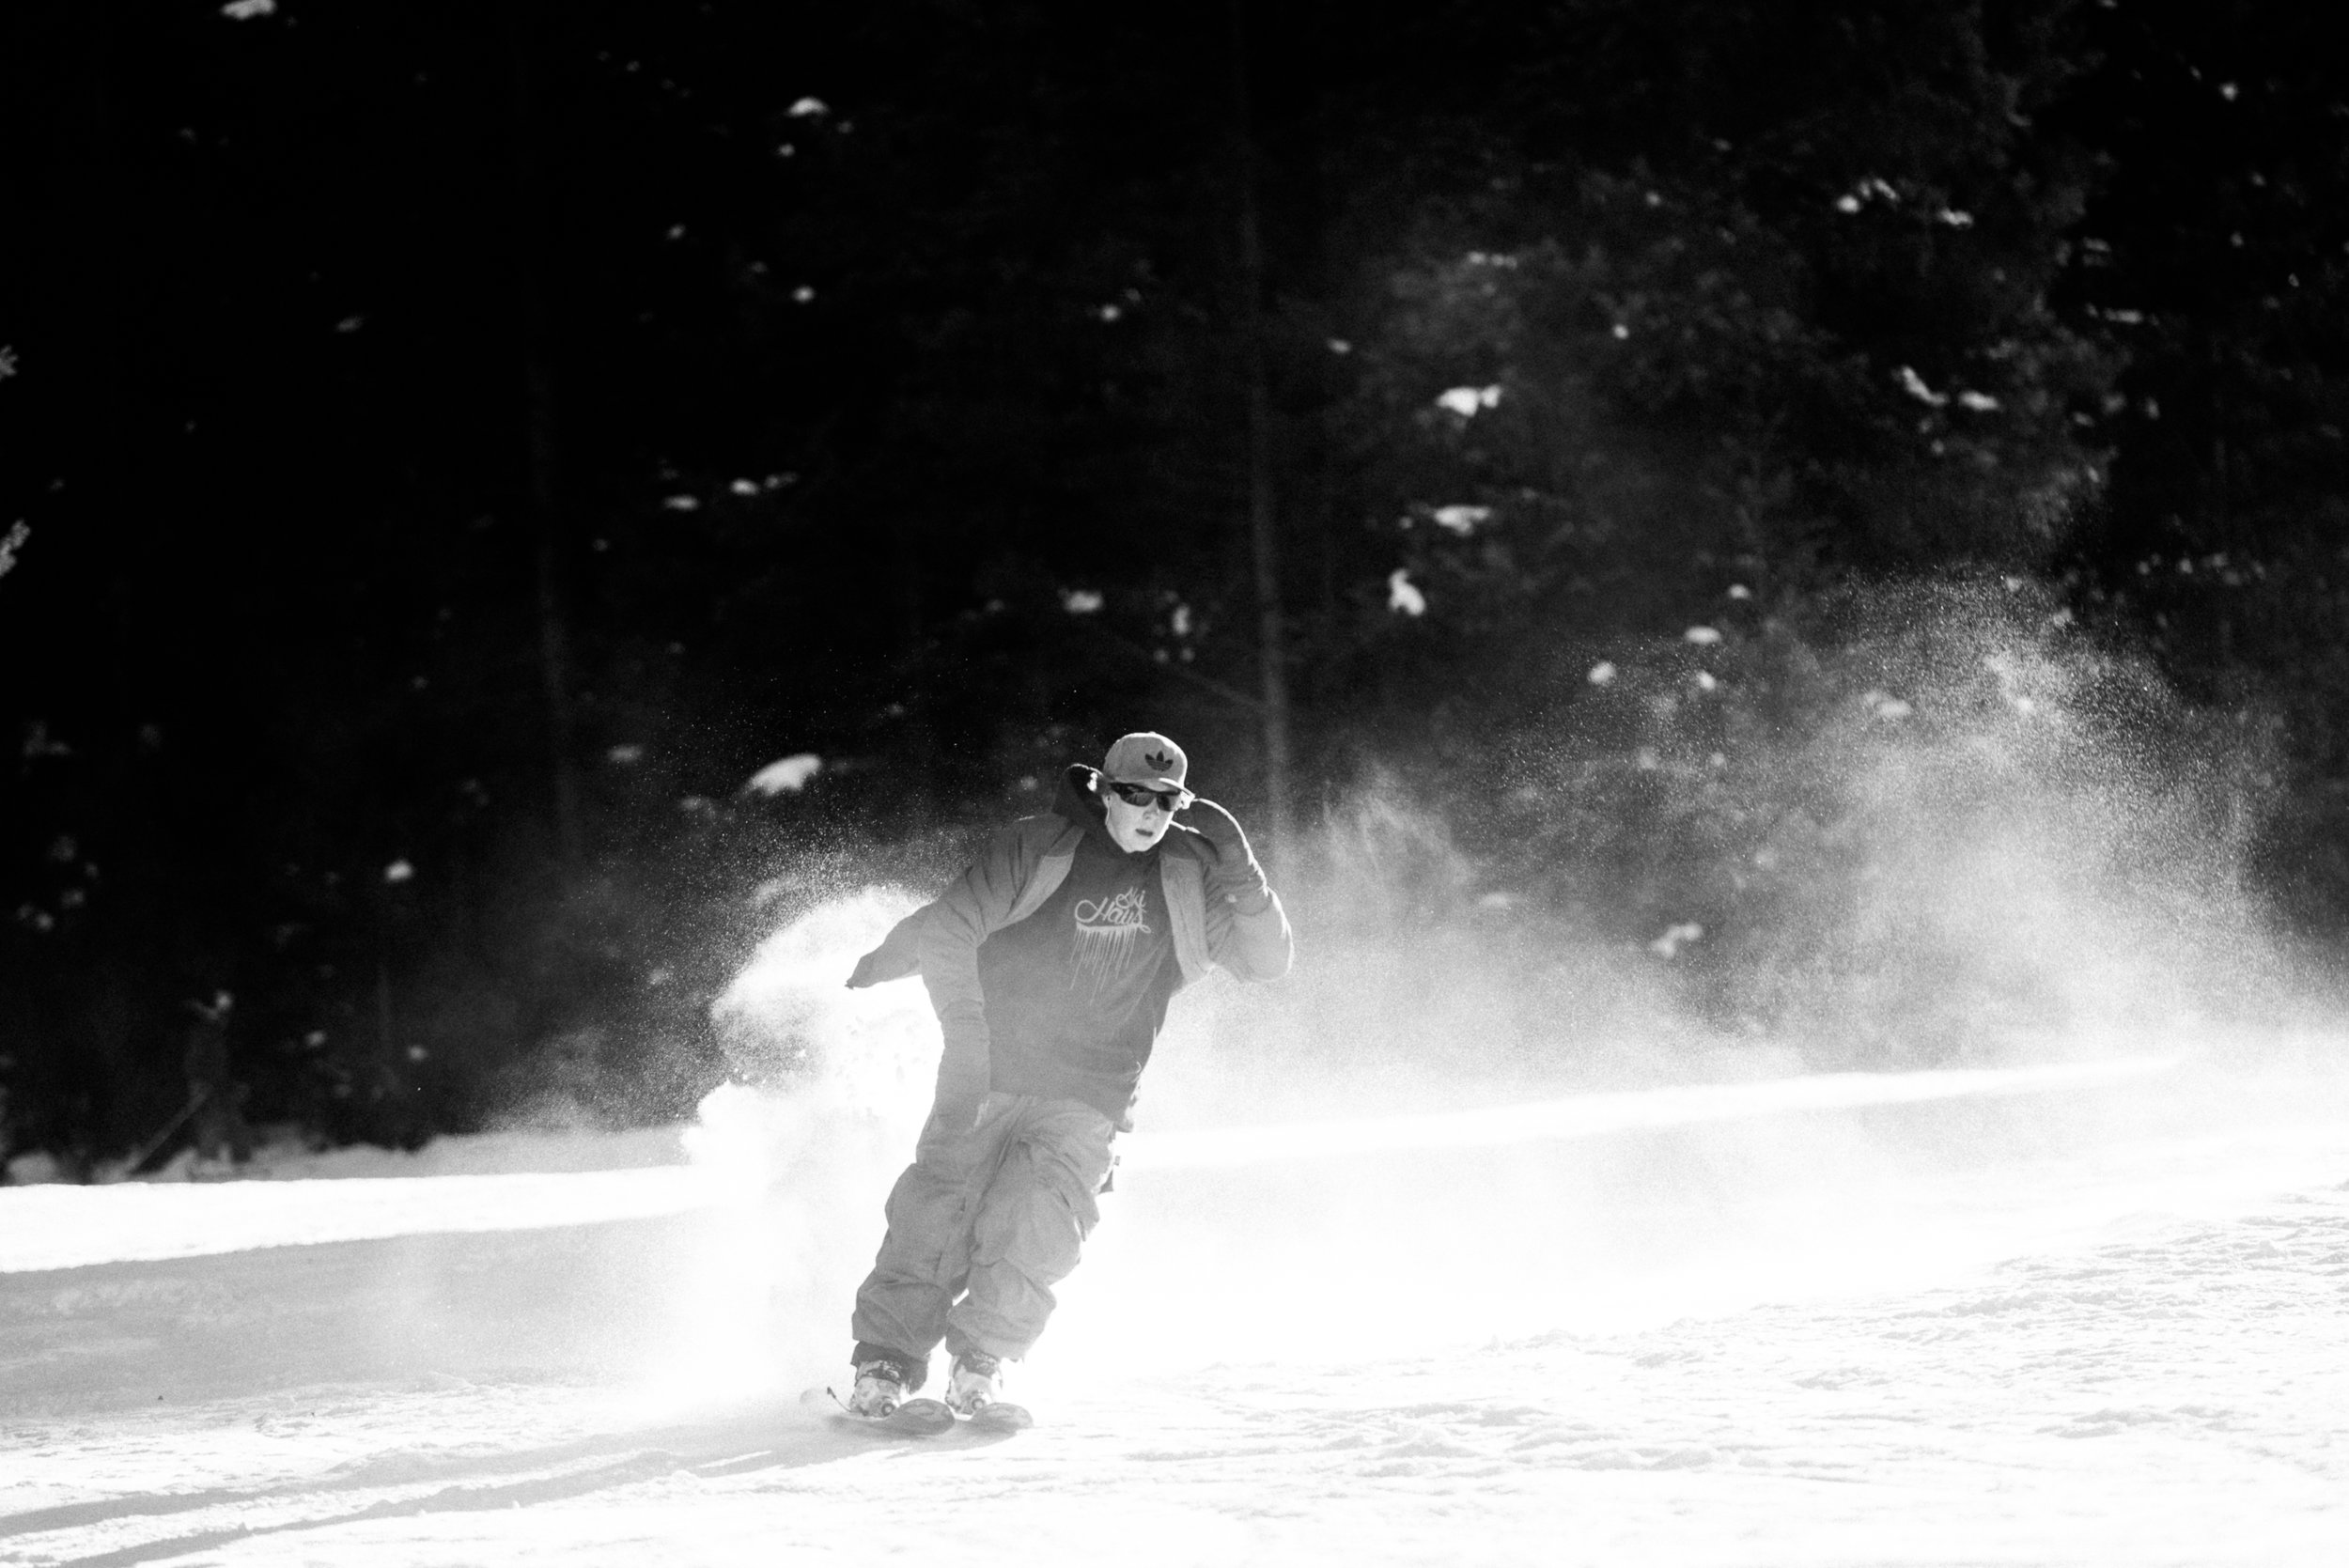 TaraShupe_Outdoor_Photographer_Loweprobags_Colorado_Copper_Mountains_Ski_48.jpg